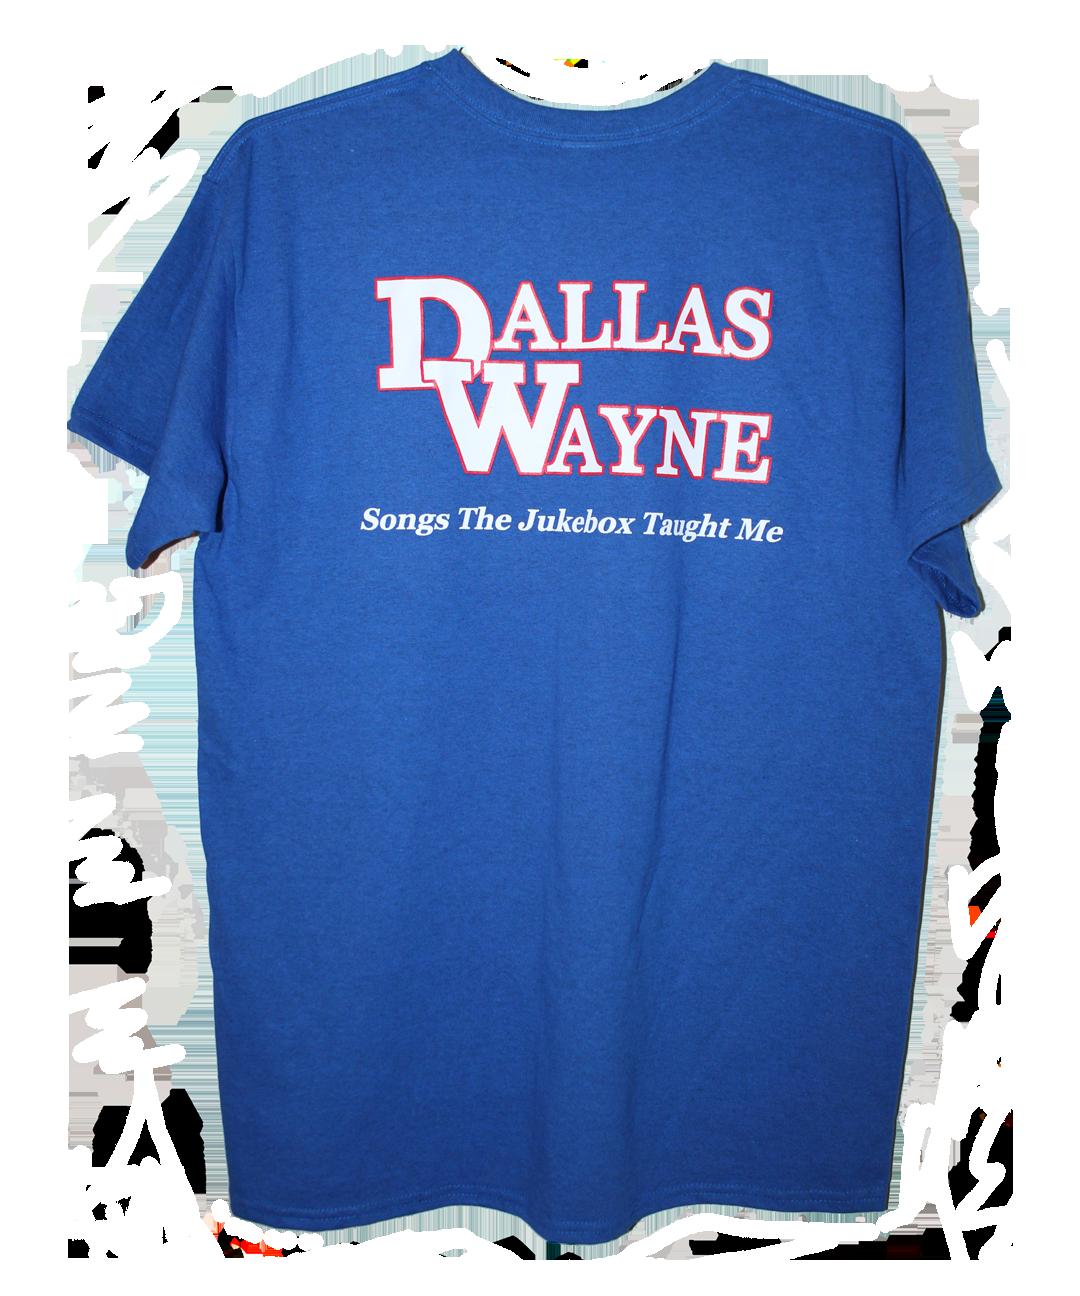 Dallas Wayne Jukebox T-shirt, Blue